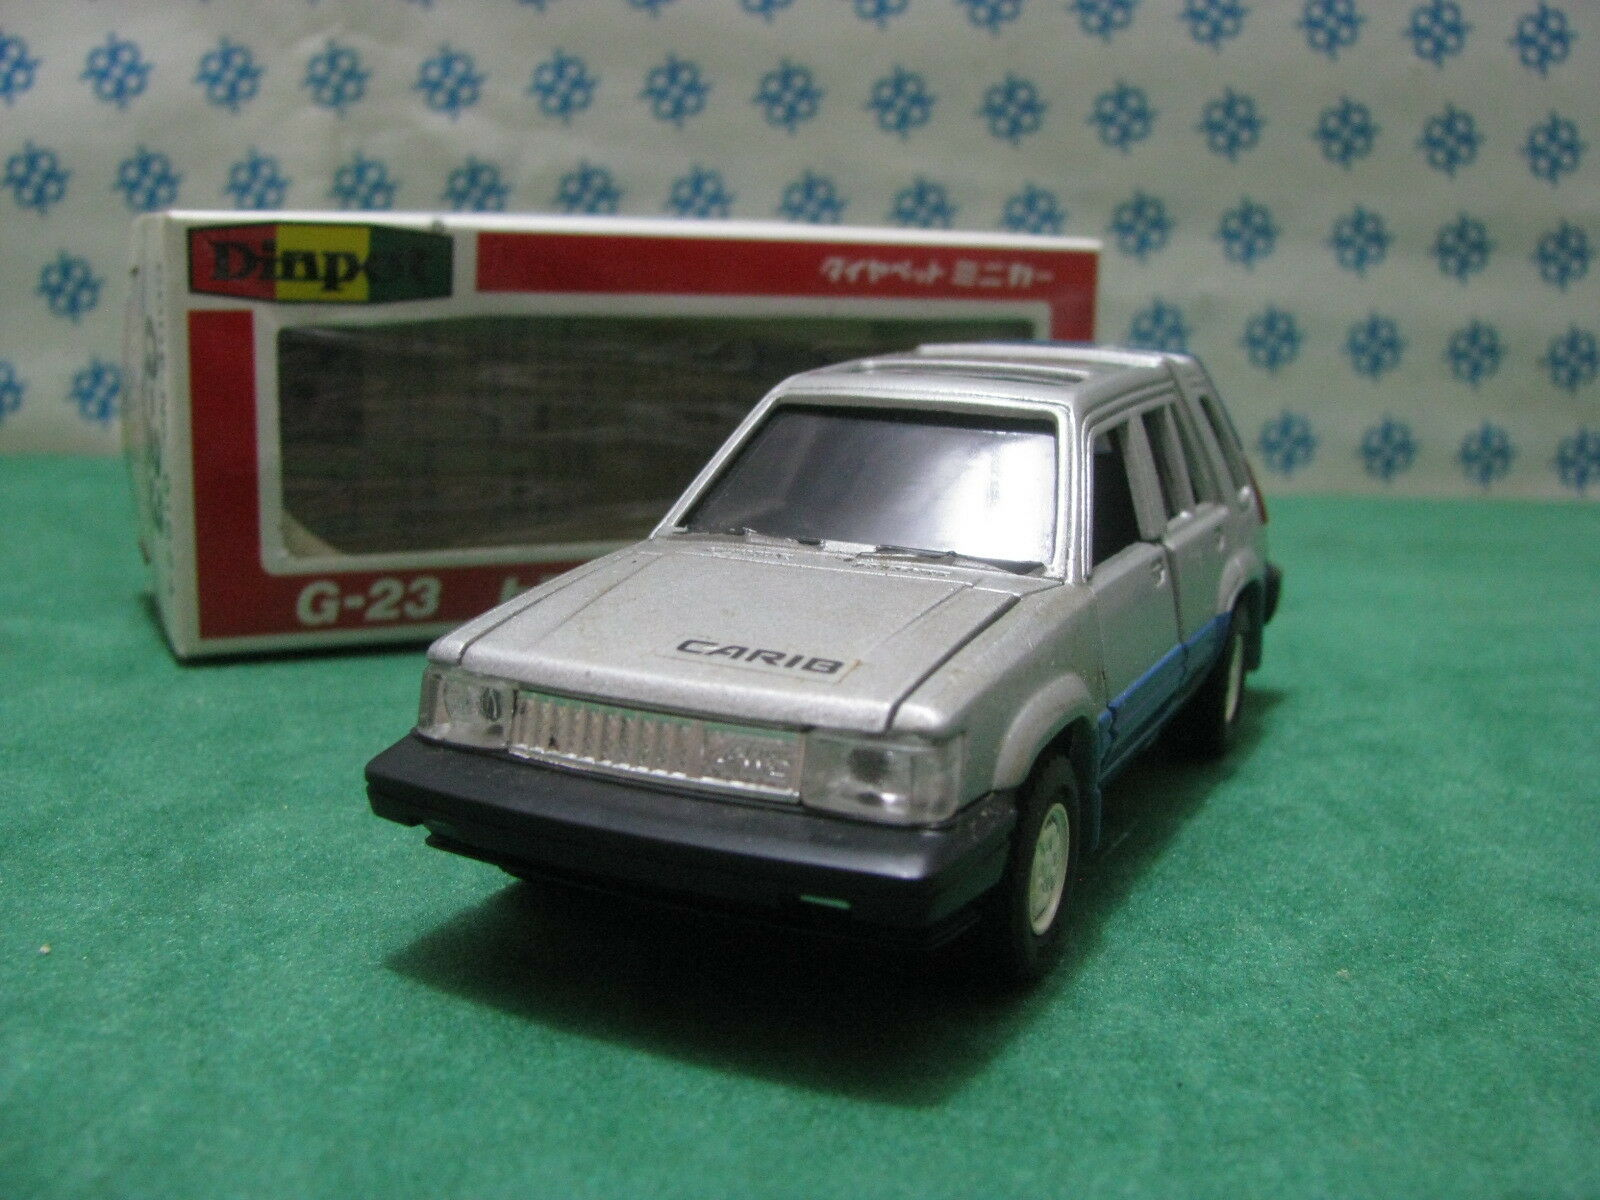 Vintage - TOYOTA Sprinter Carib 4WD - 1 40 G-23 Diapet Yonezawa toys n°01624